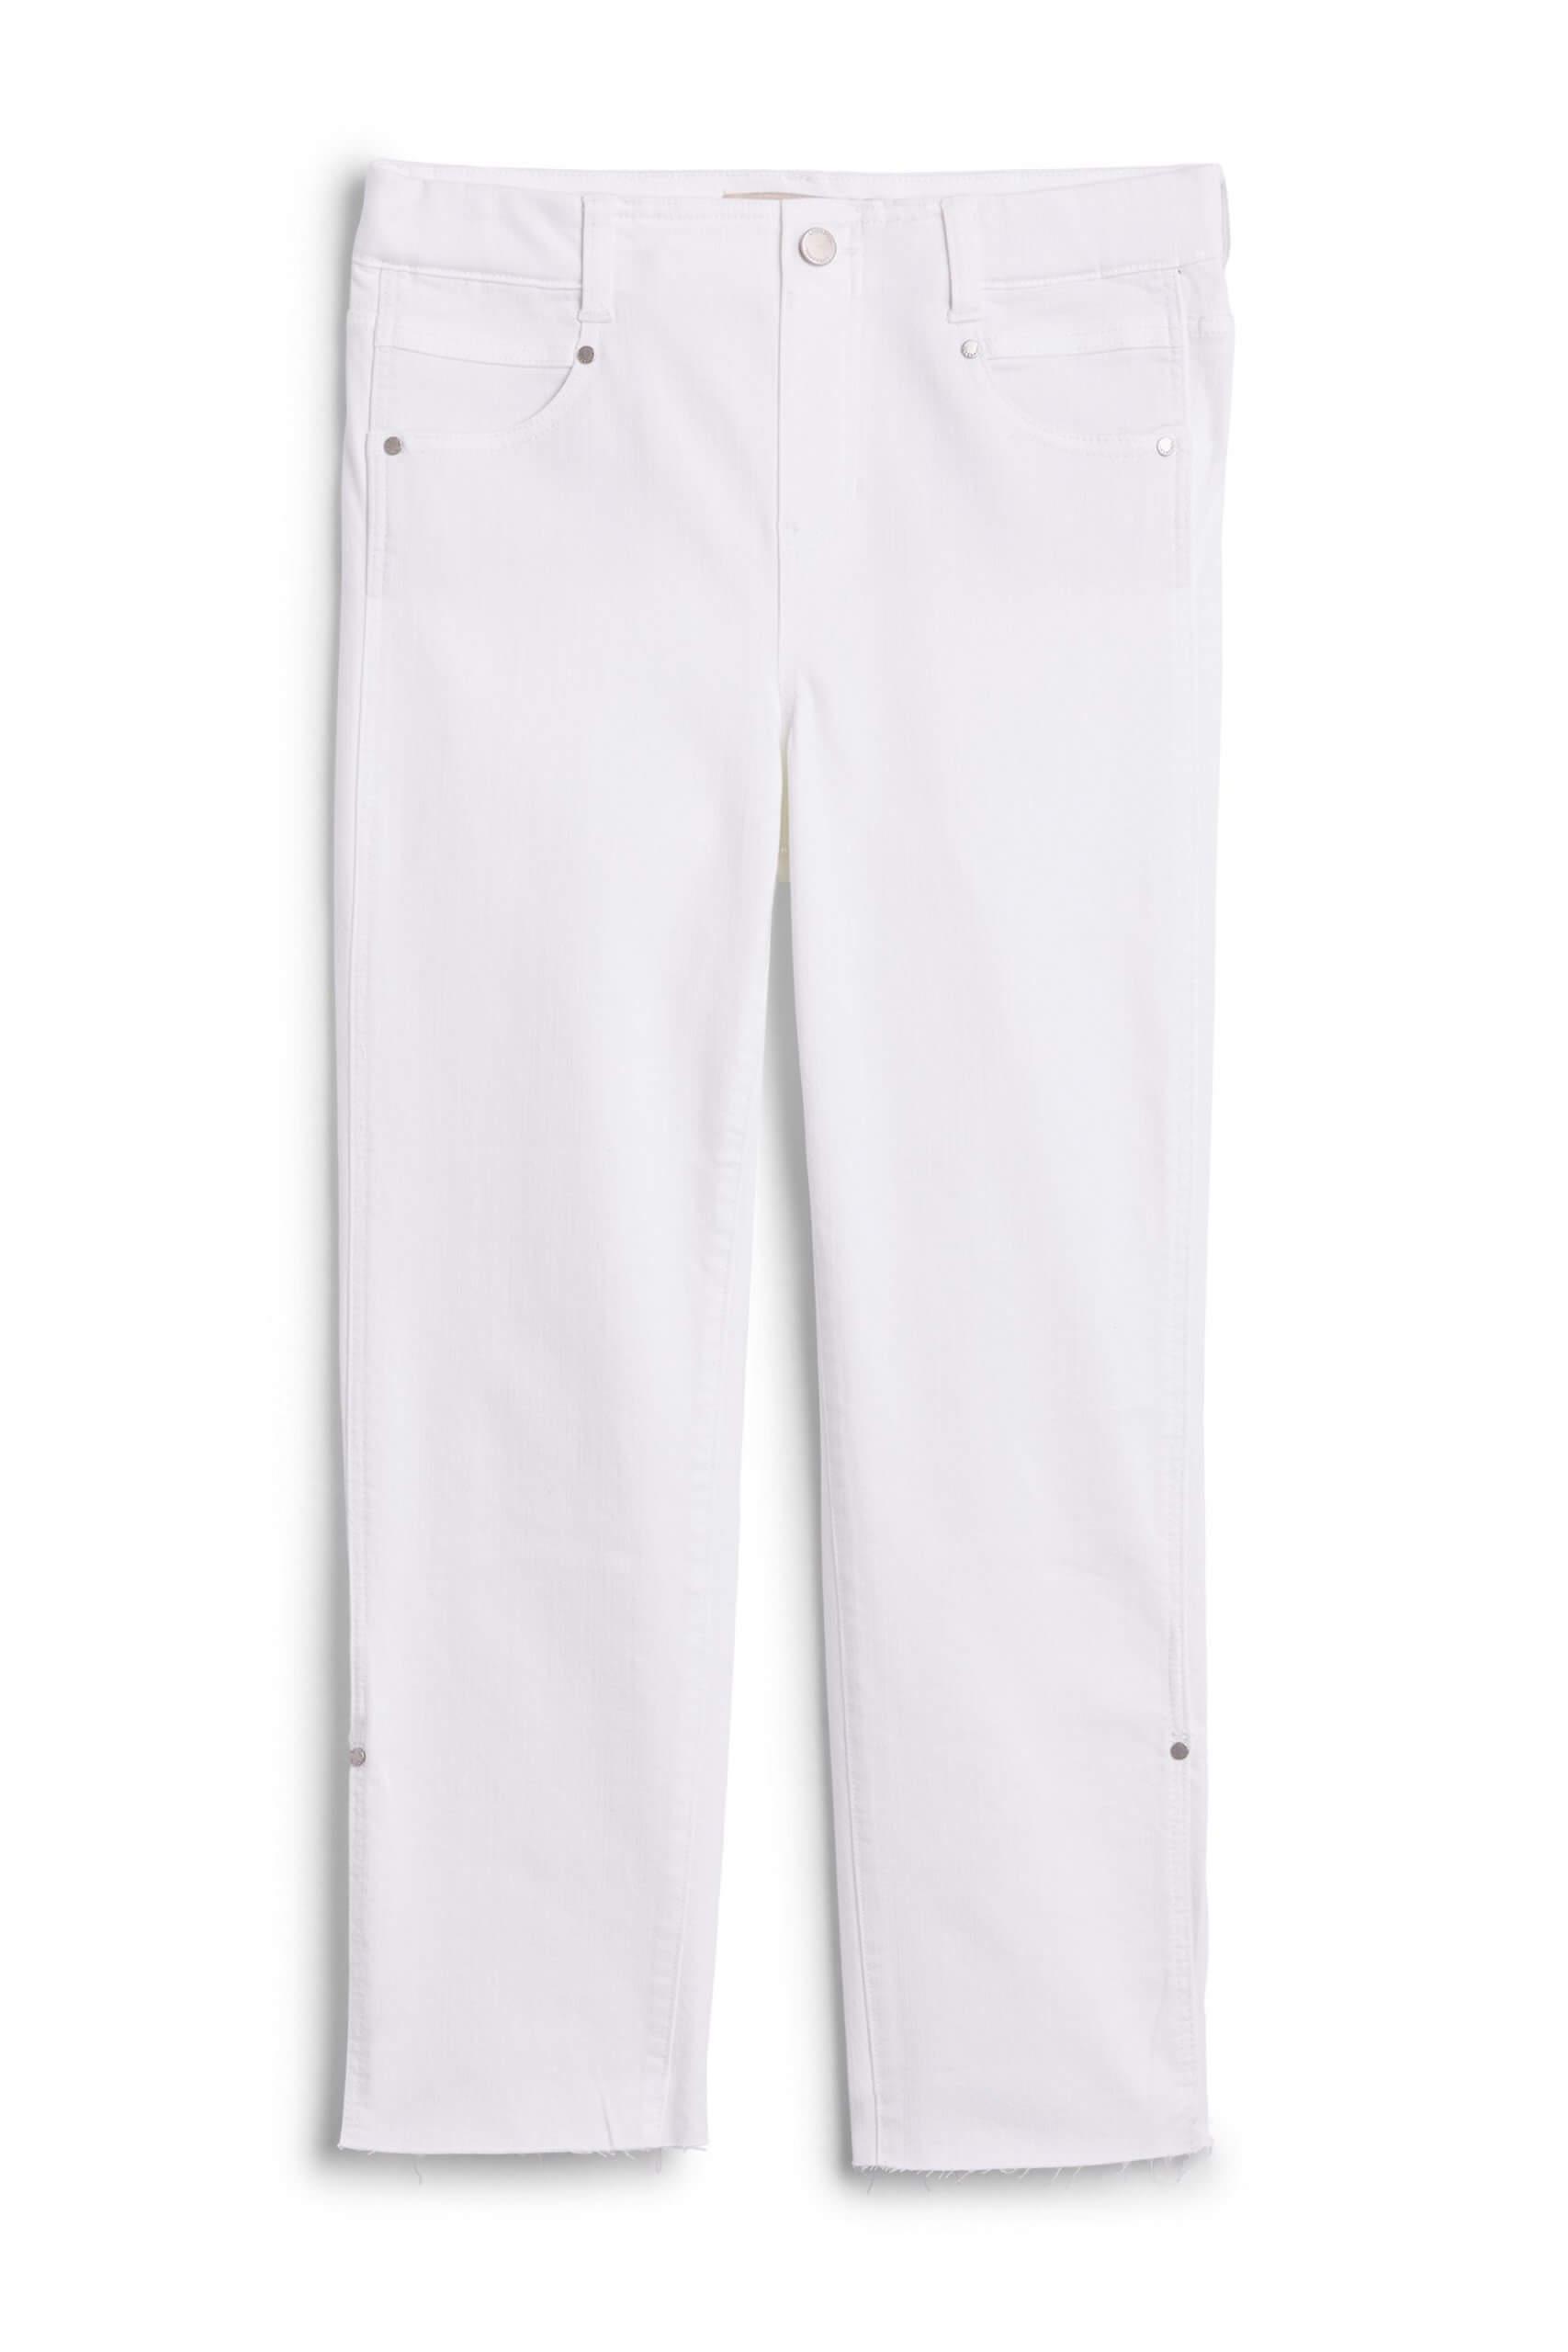 Stitch Fix Women's white cropped jeans.